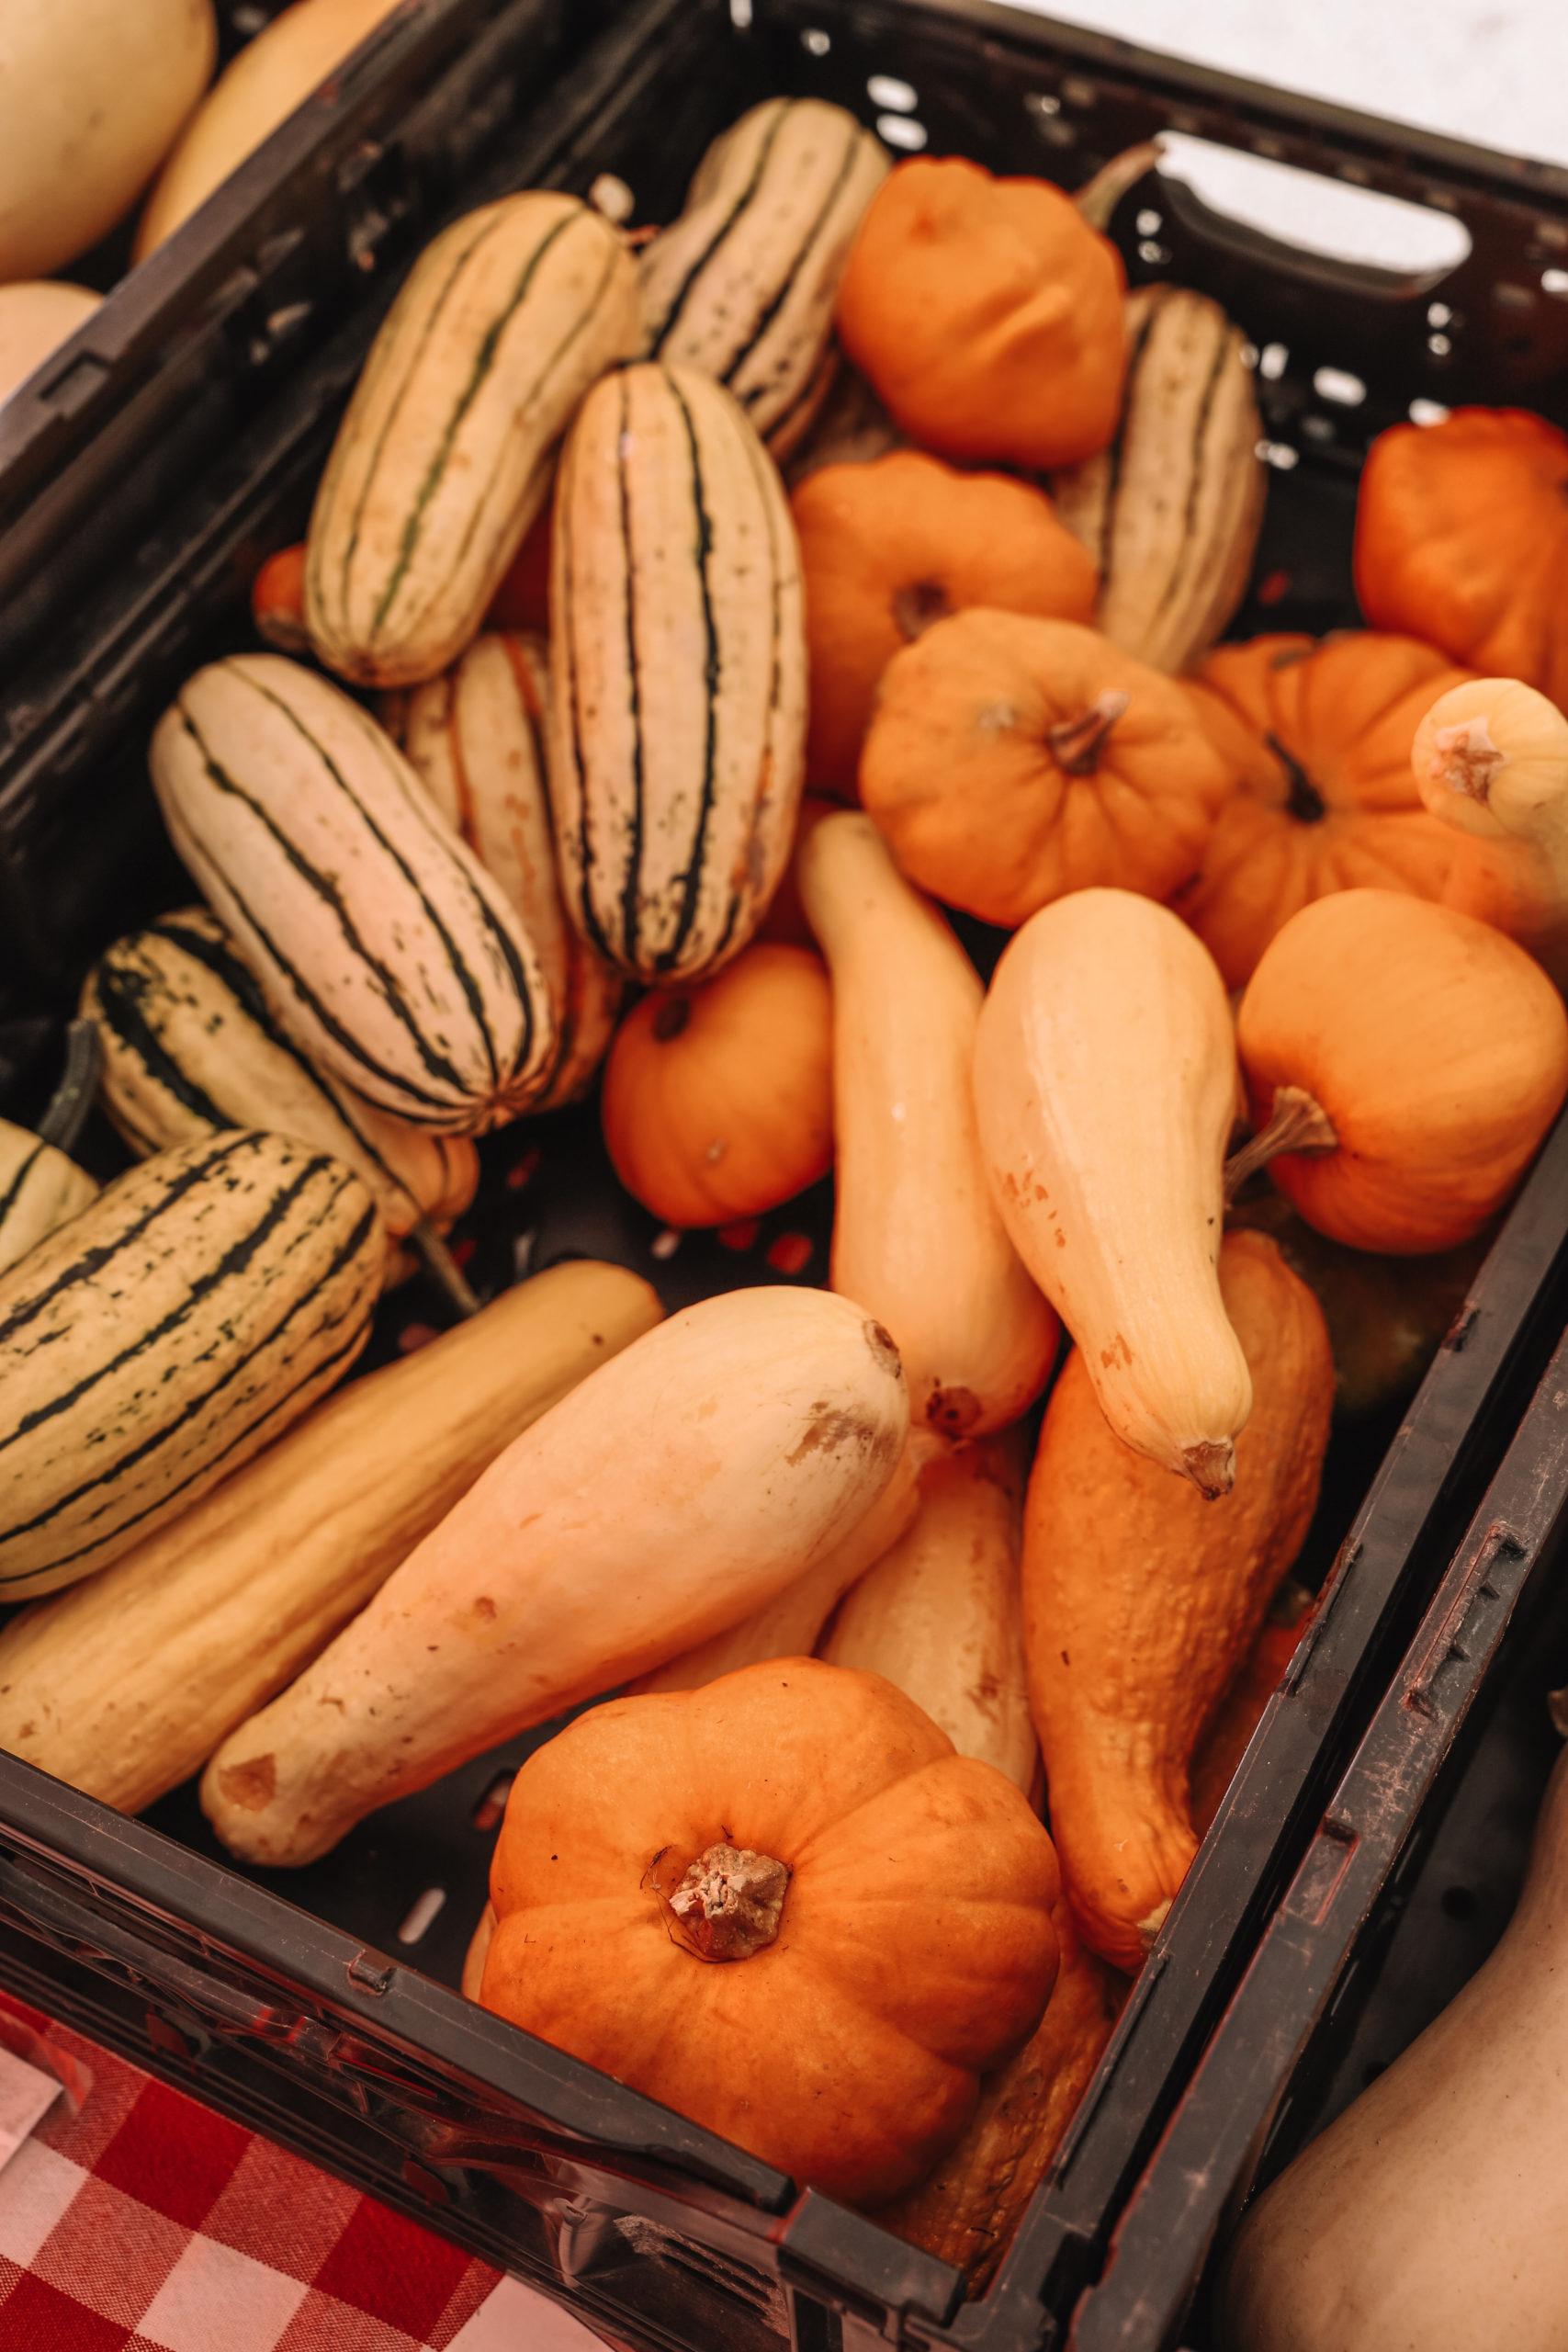 fall vegetables in a bin